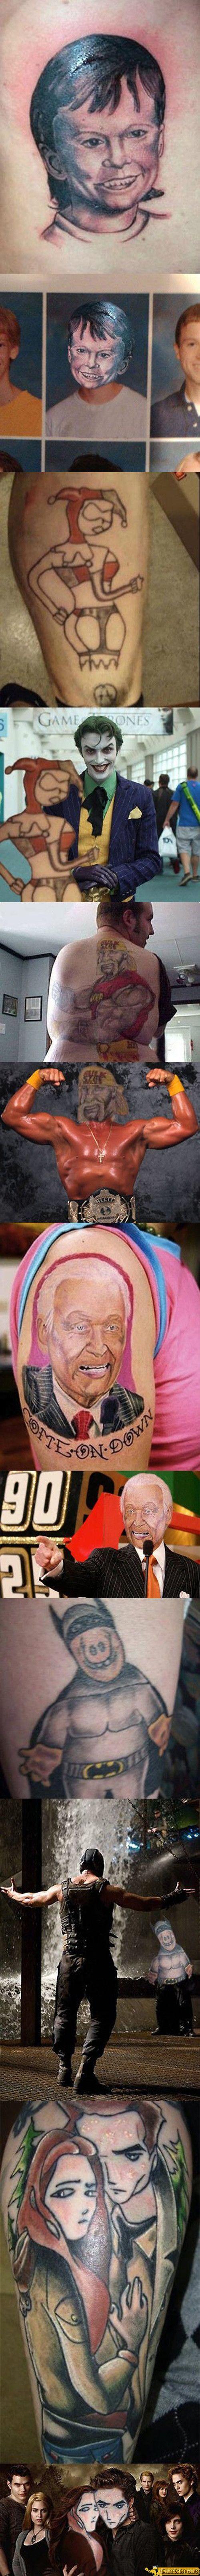 best tatuajes images on pinterest tattoo ideas geometric